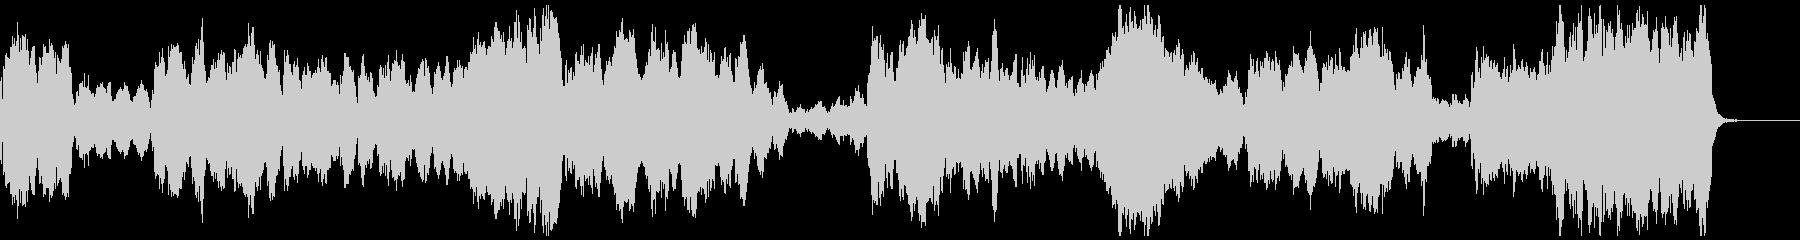 BWV1070/2『トルネオ』 の未再生の波形